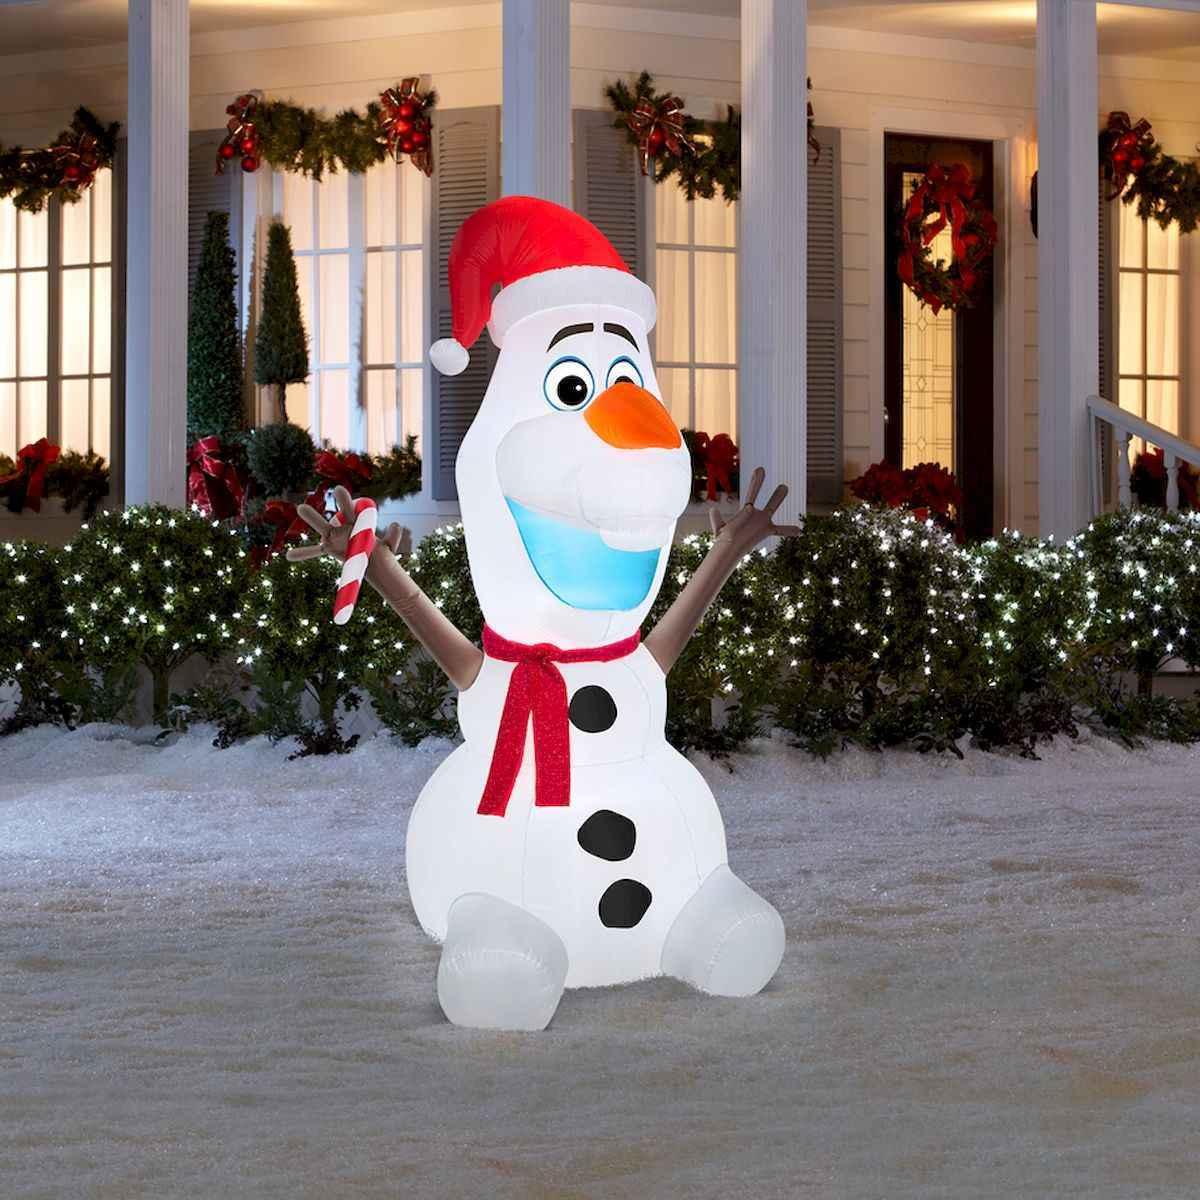 40 amazing outdoor christmas decorations ideas (19)